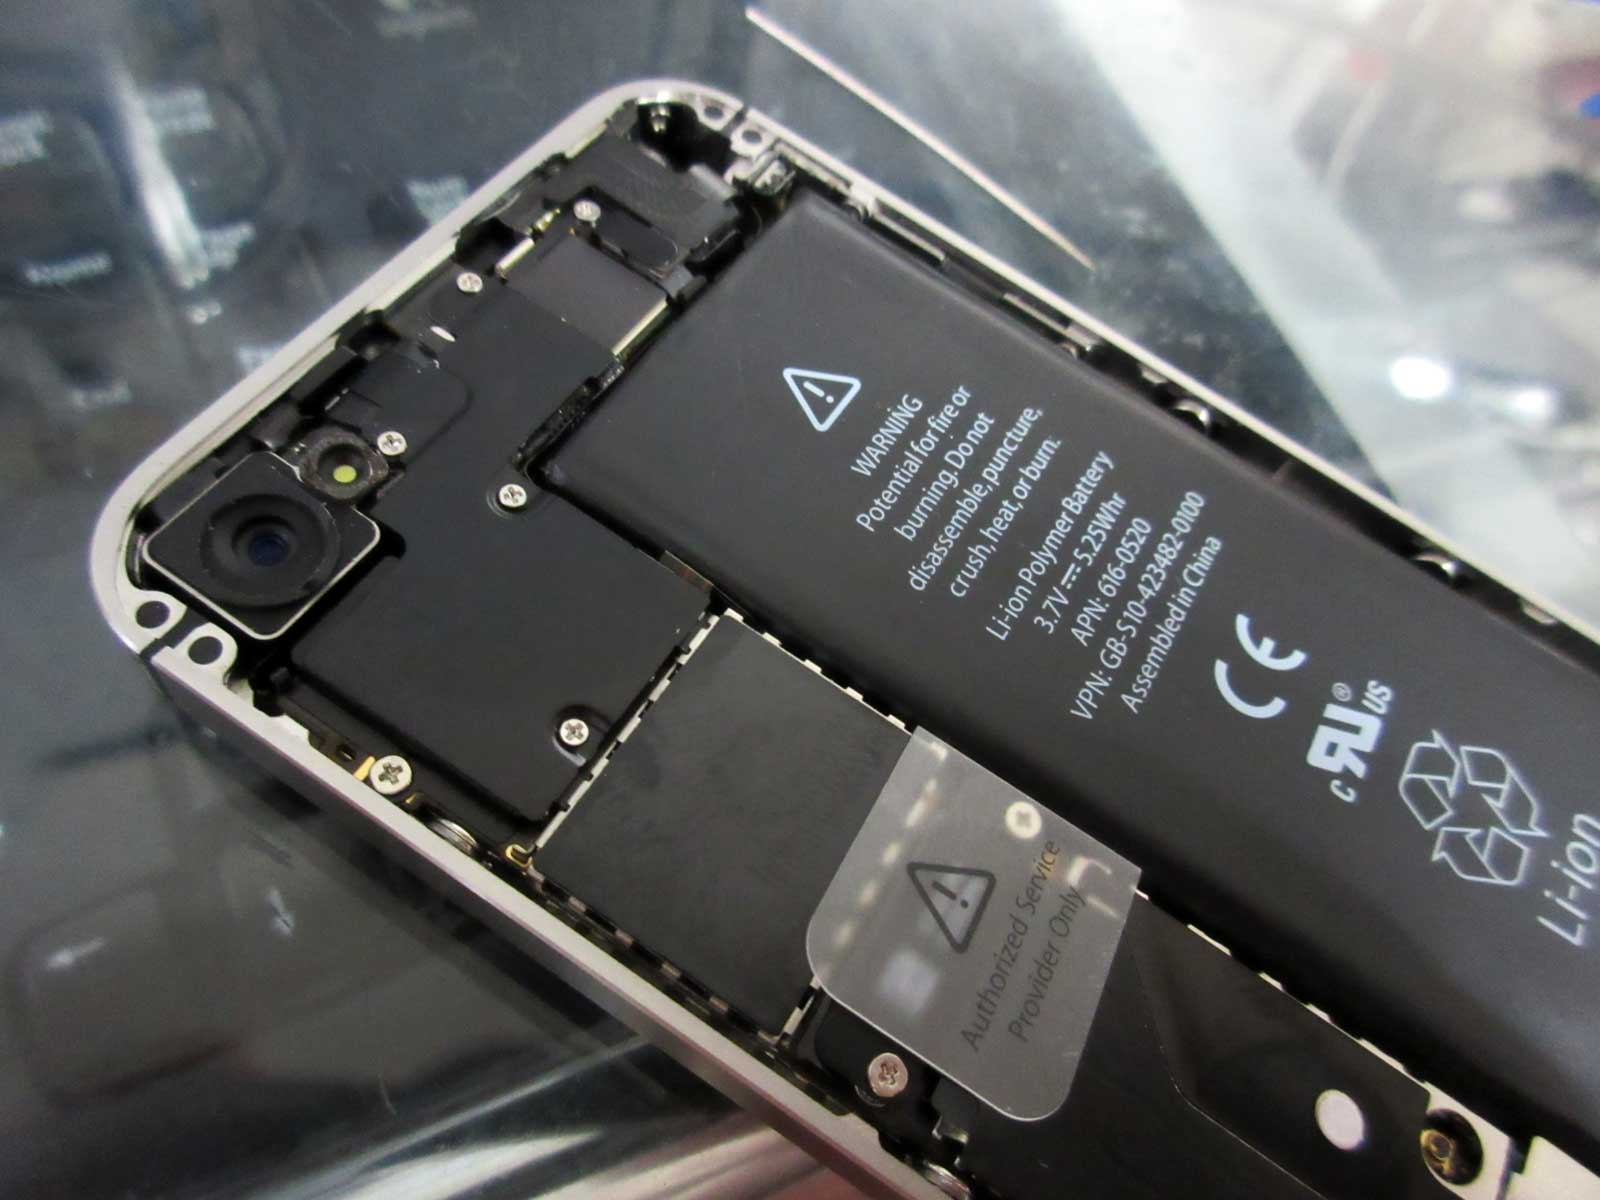 iOS против Android: почему у последнего так много оперативной памяти